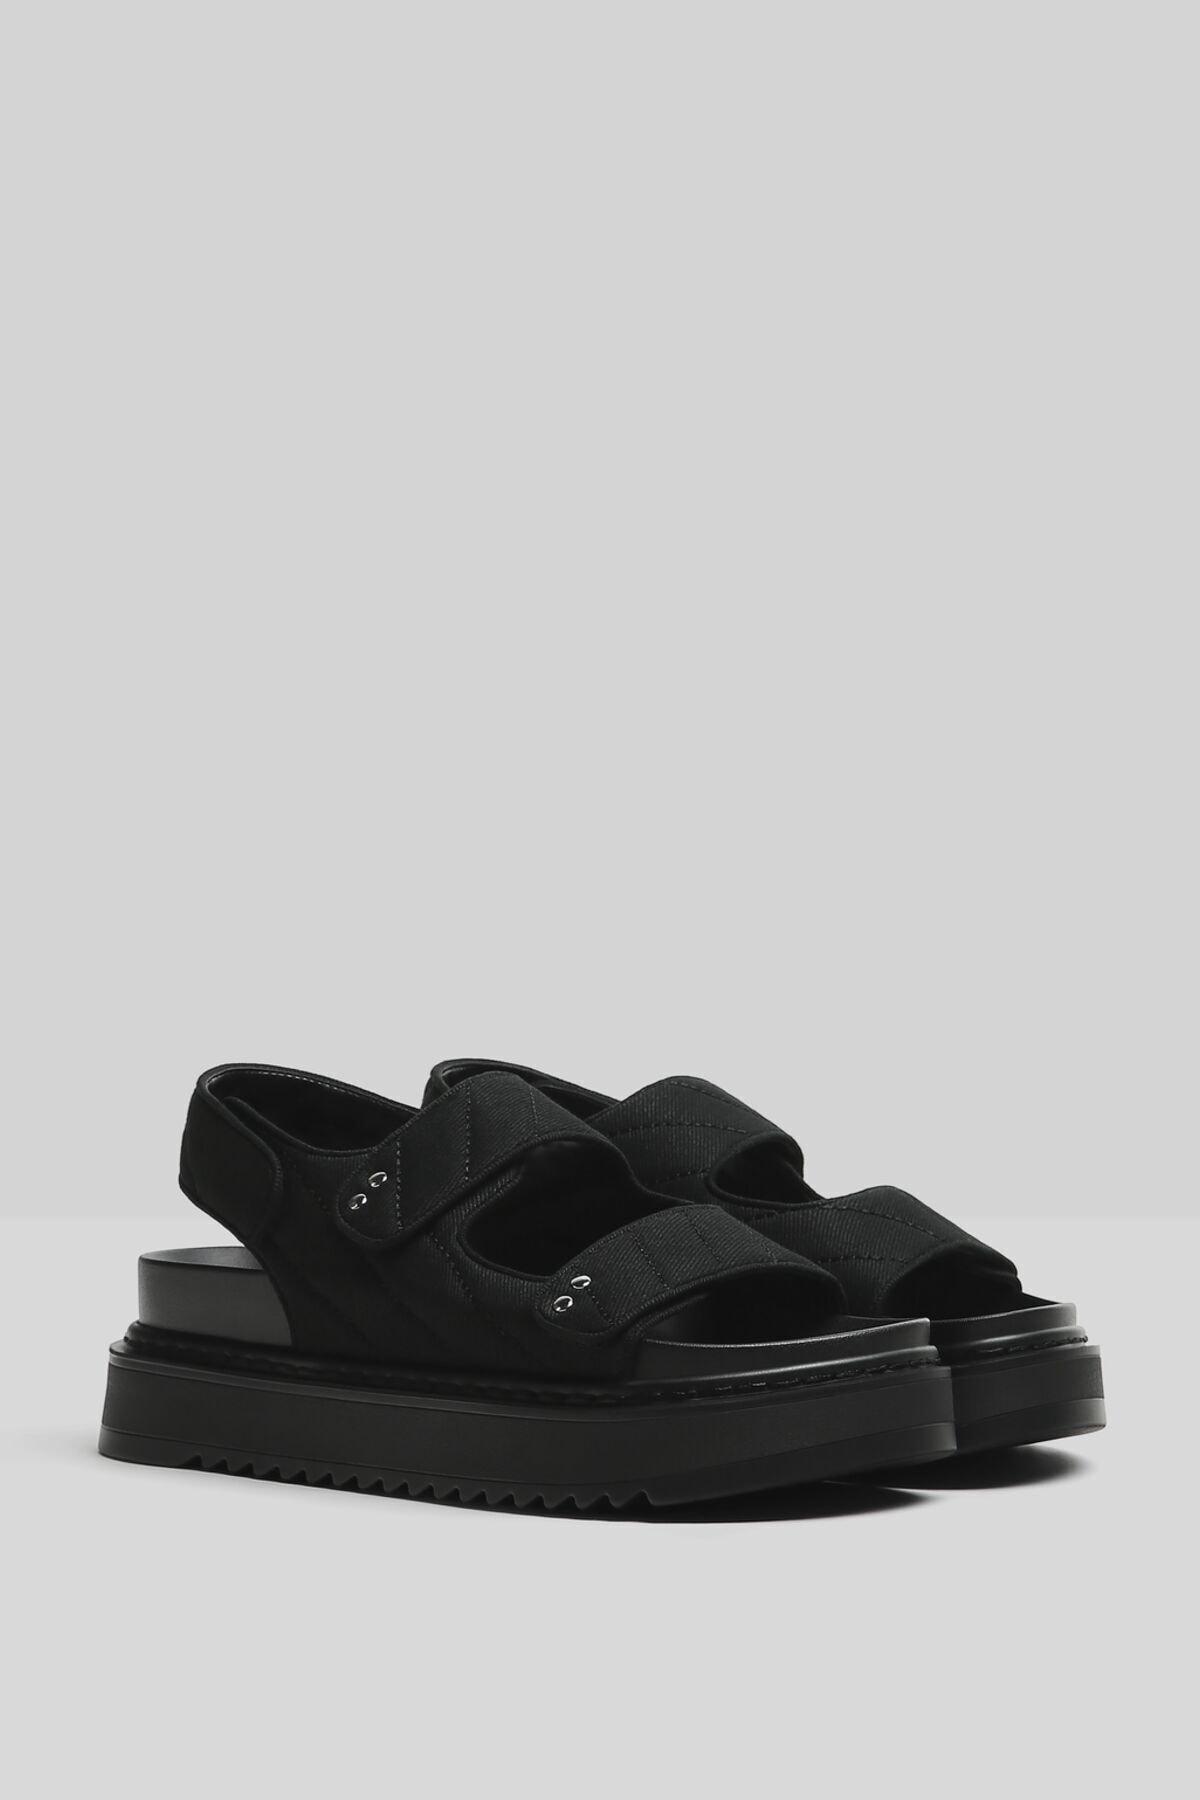 Bershka Kadın Siyah Üstü Dikişli Platform Sandalet 1